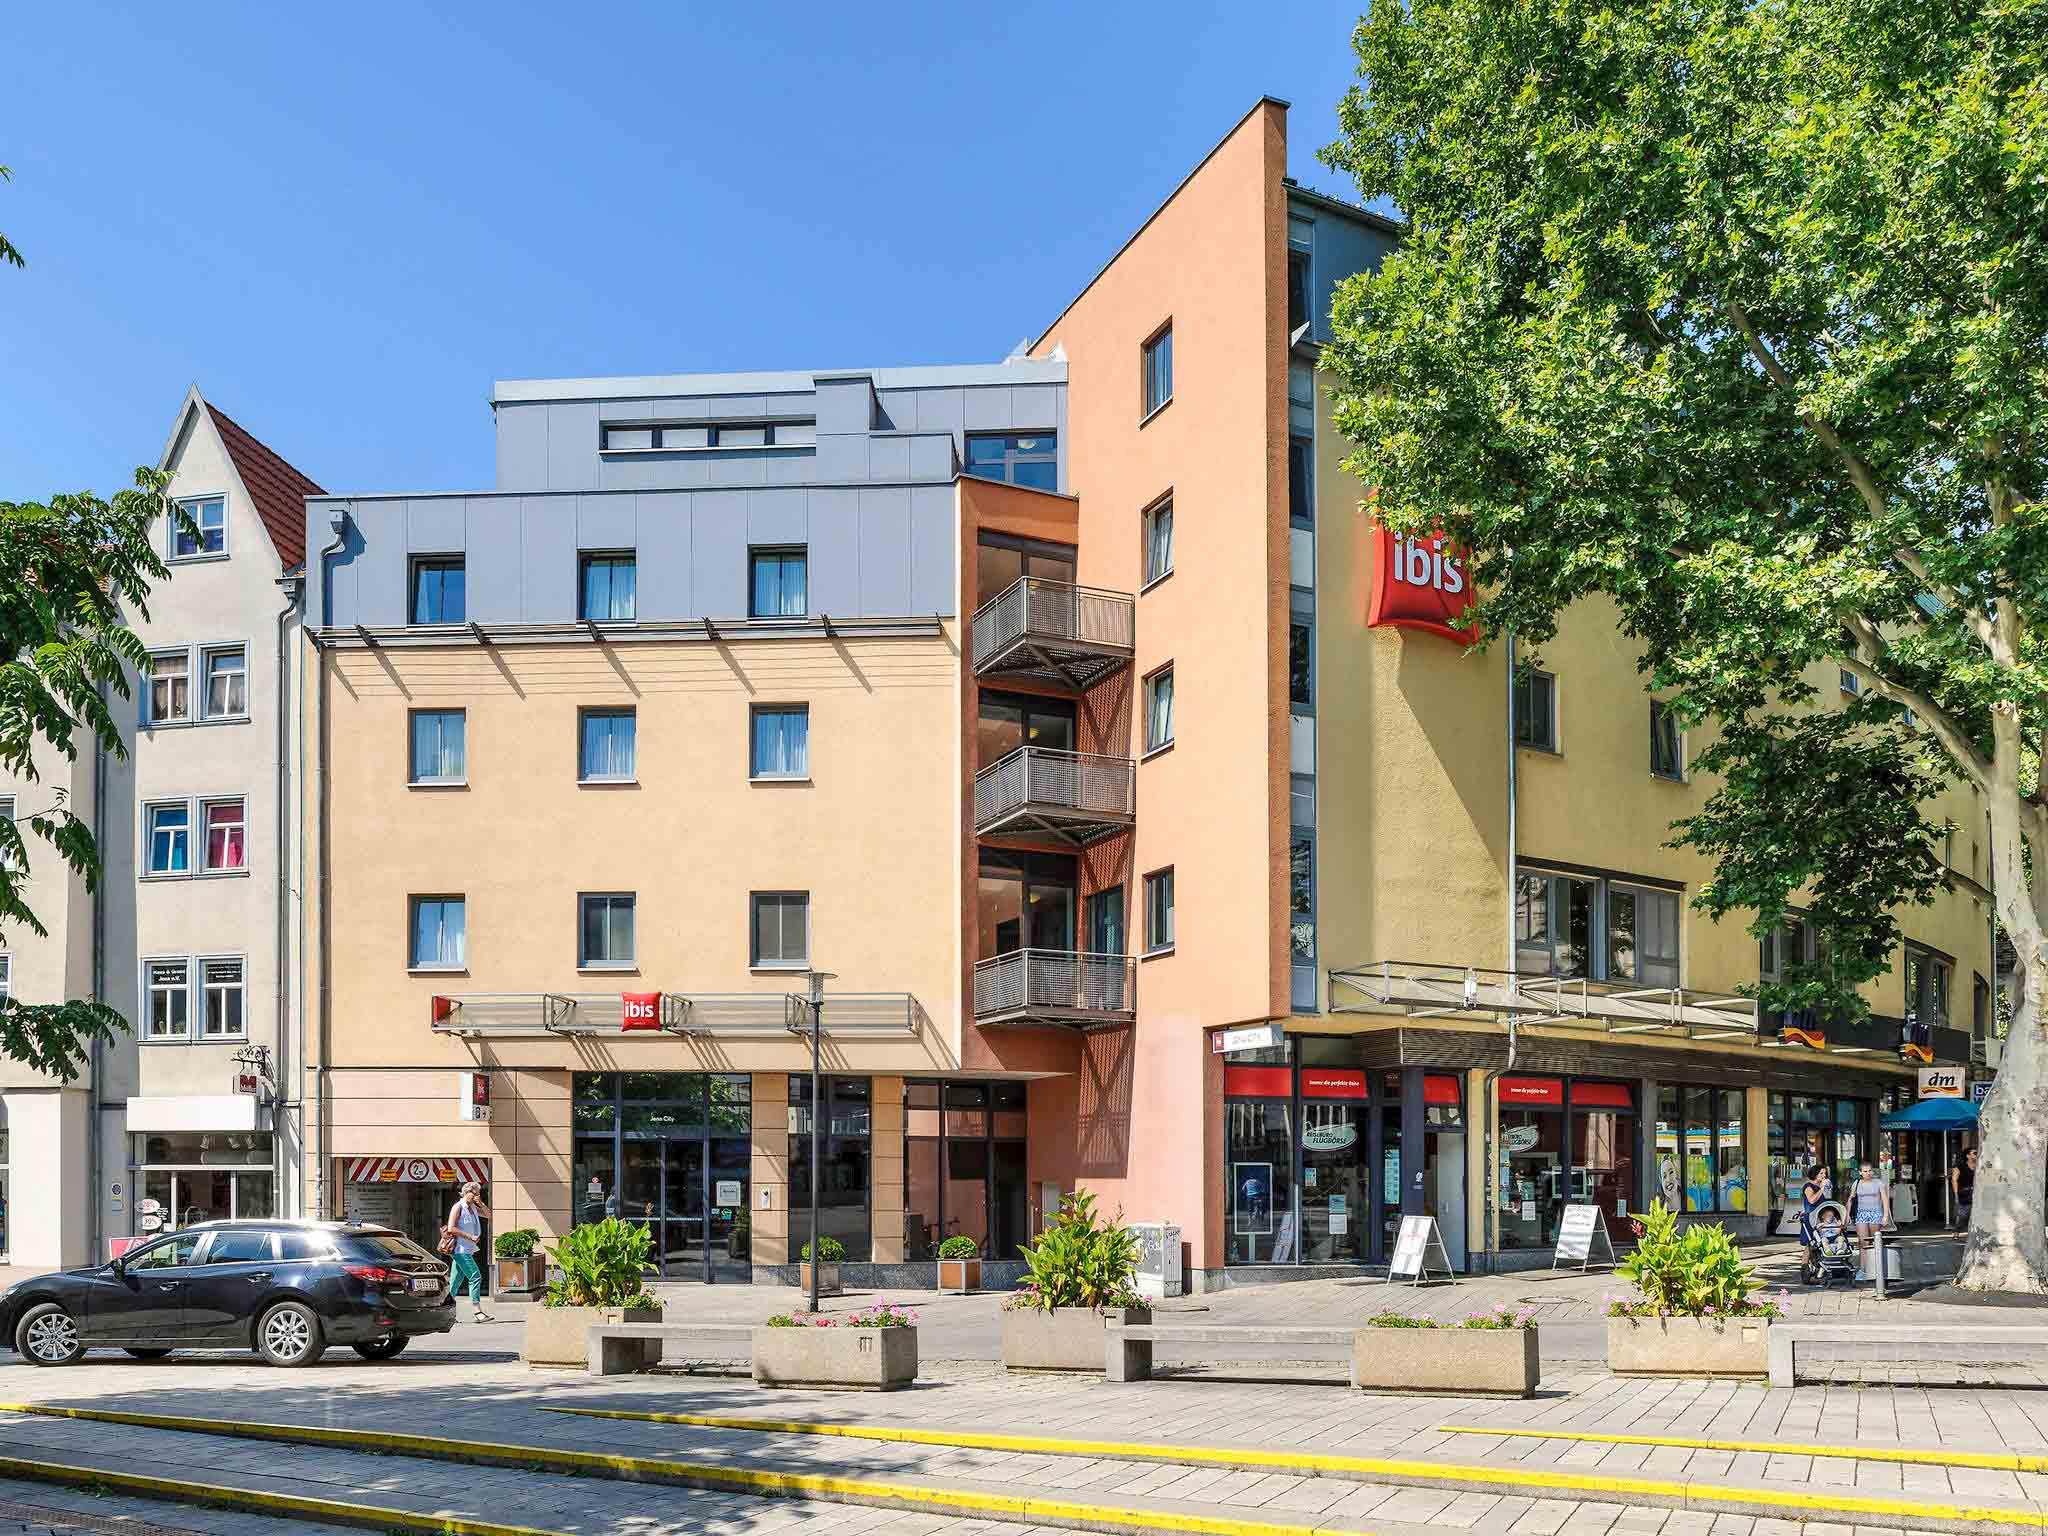 Ibis Hotel Jena